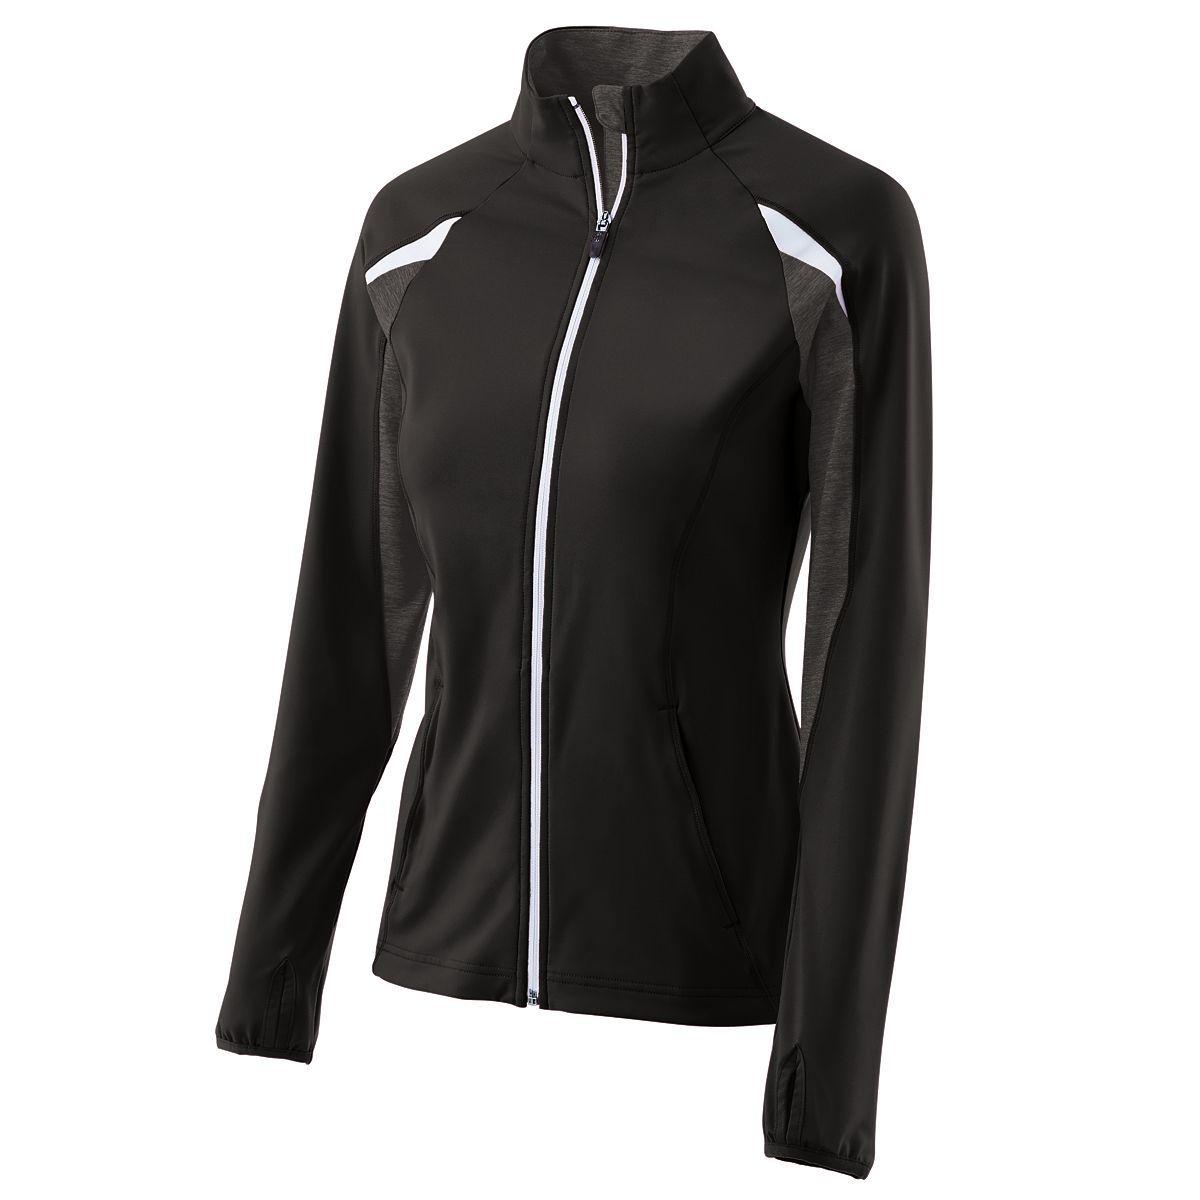 Ladies Tumble Jacket - BLACK/BLACK HEATHER/WHITE